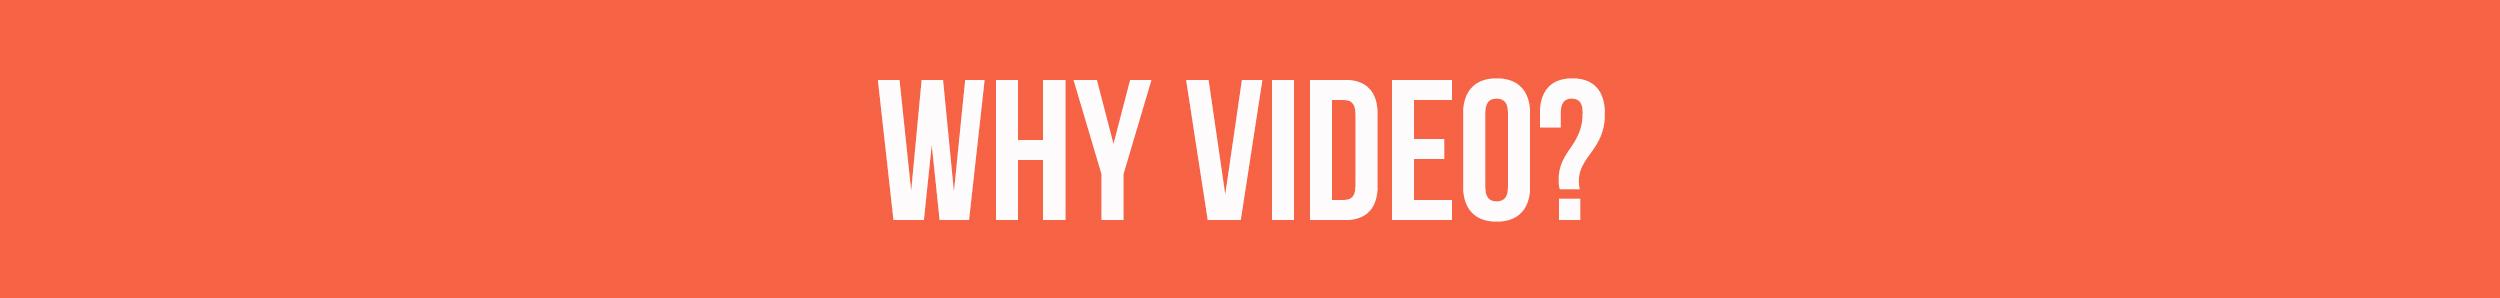 why video.jpg